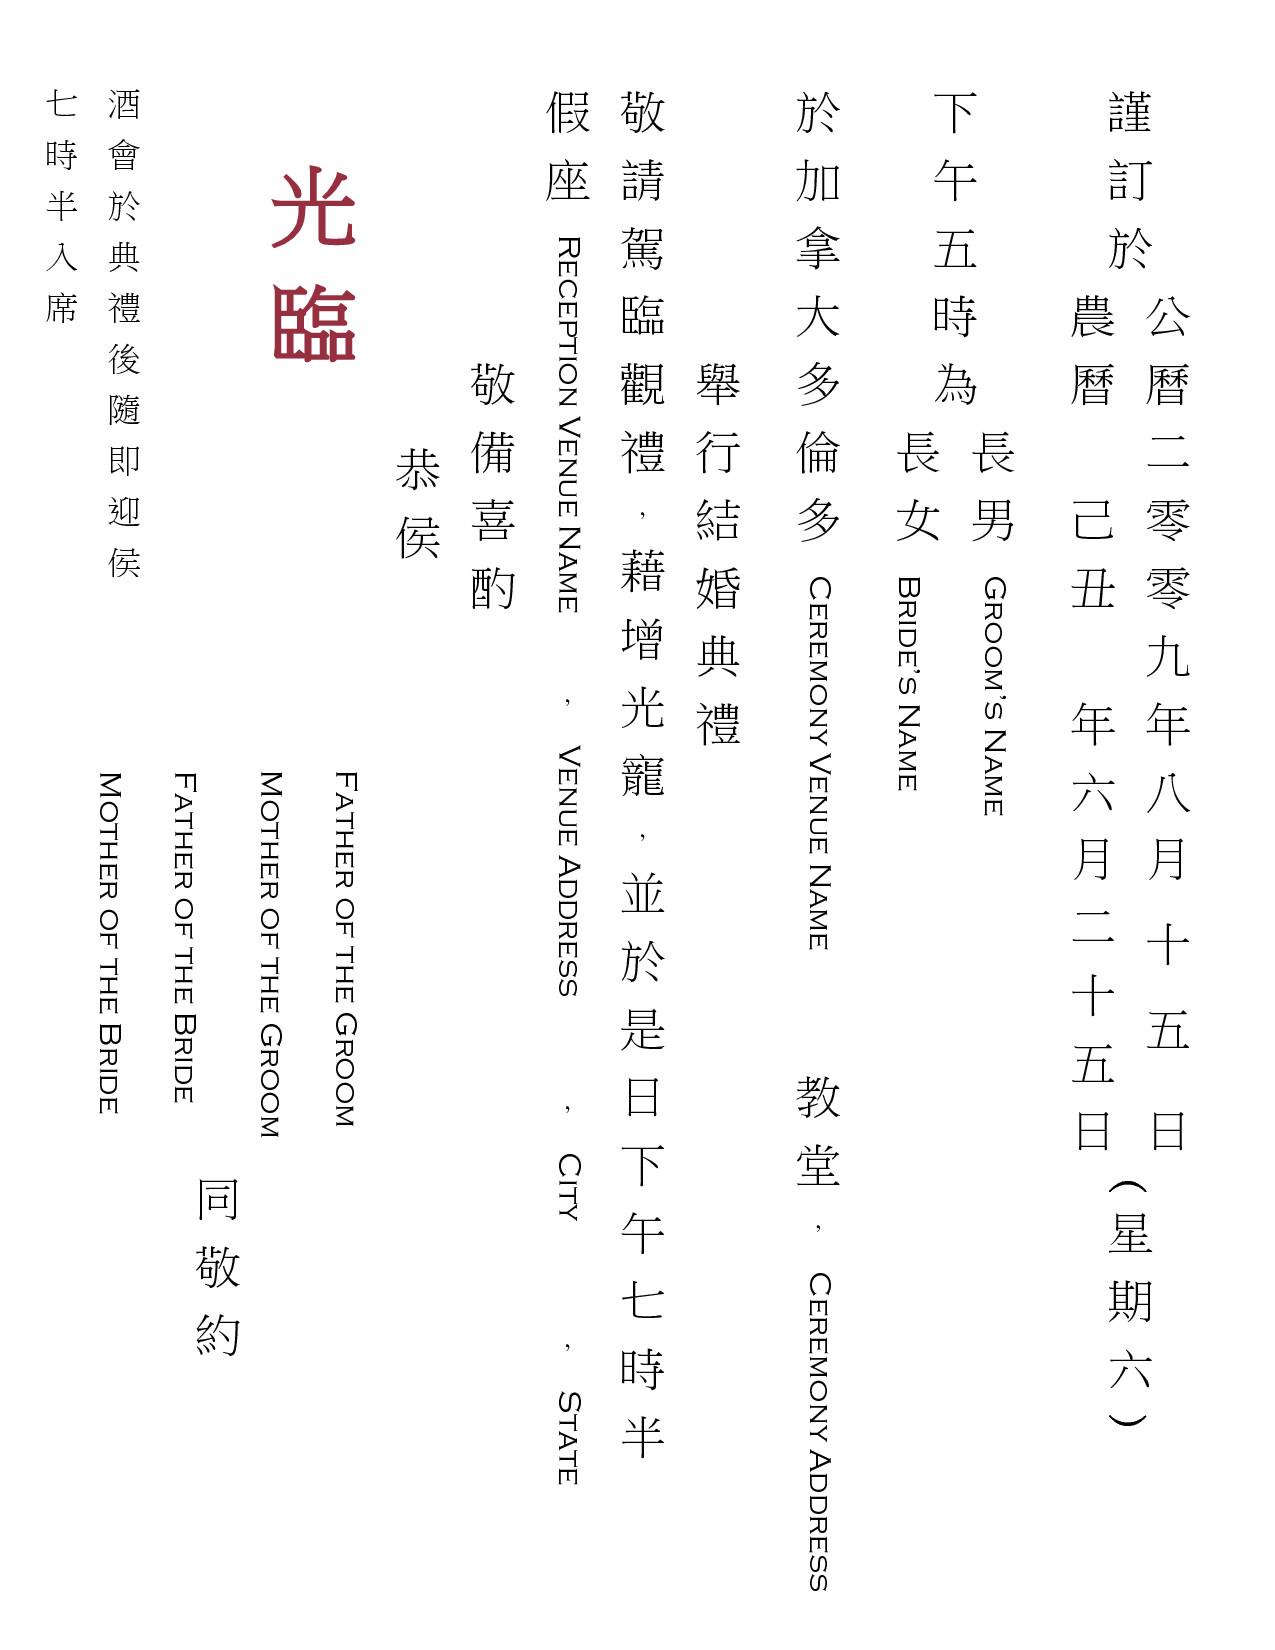 Chinese Wedding Invitation Template Word Chinese Invitation Template 1 In 2019 Chinese